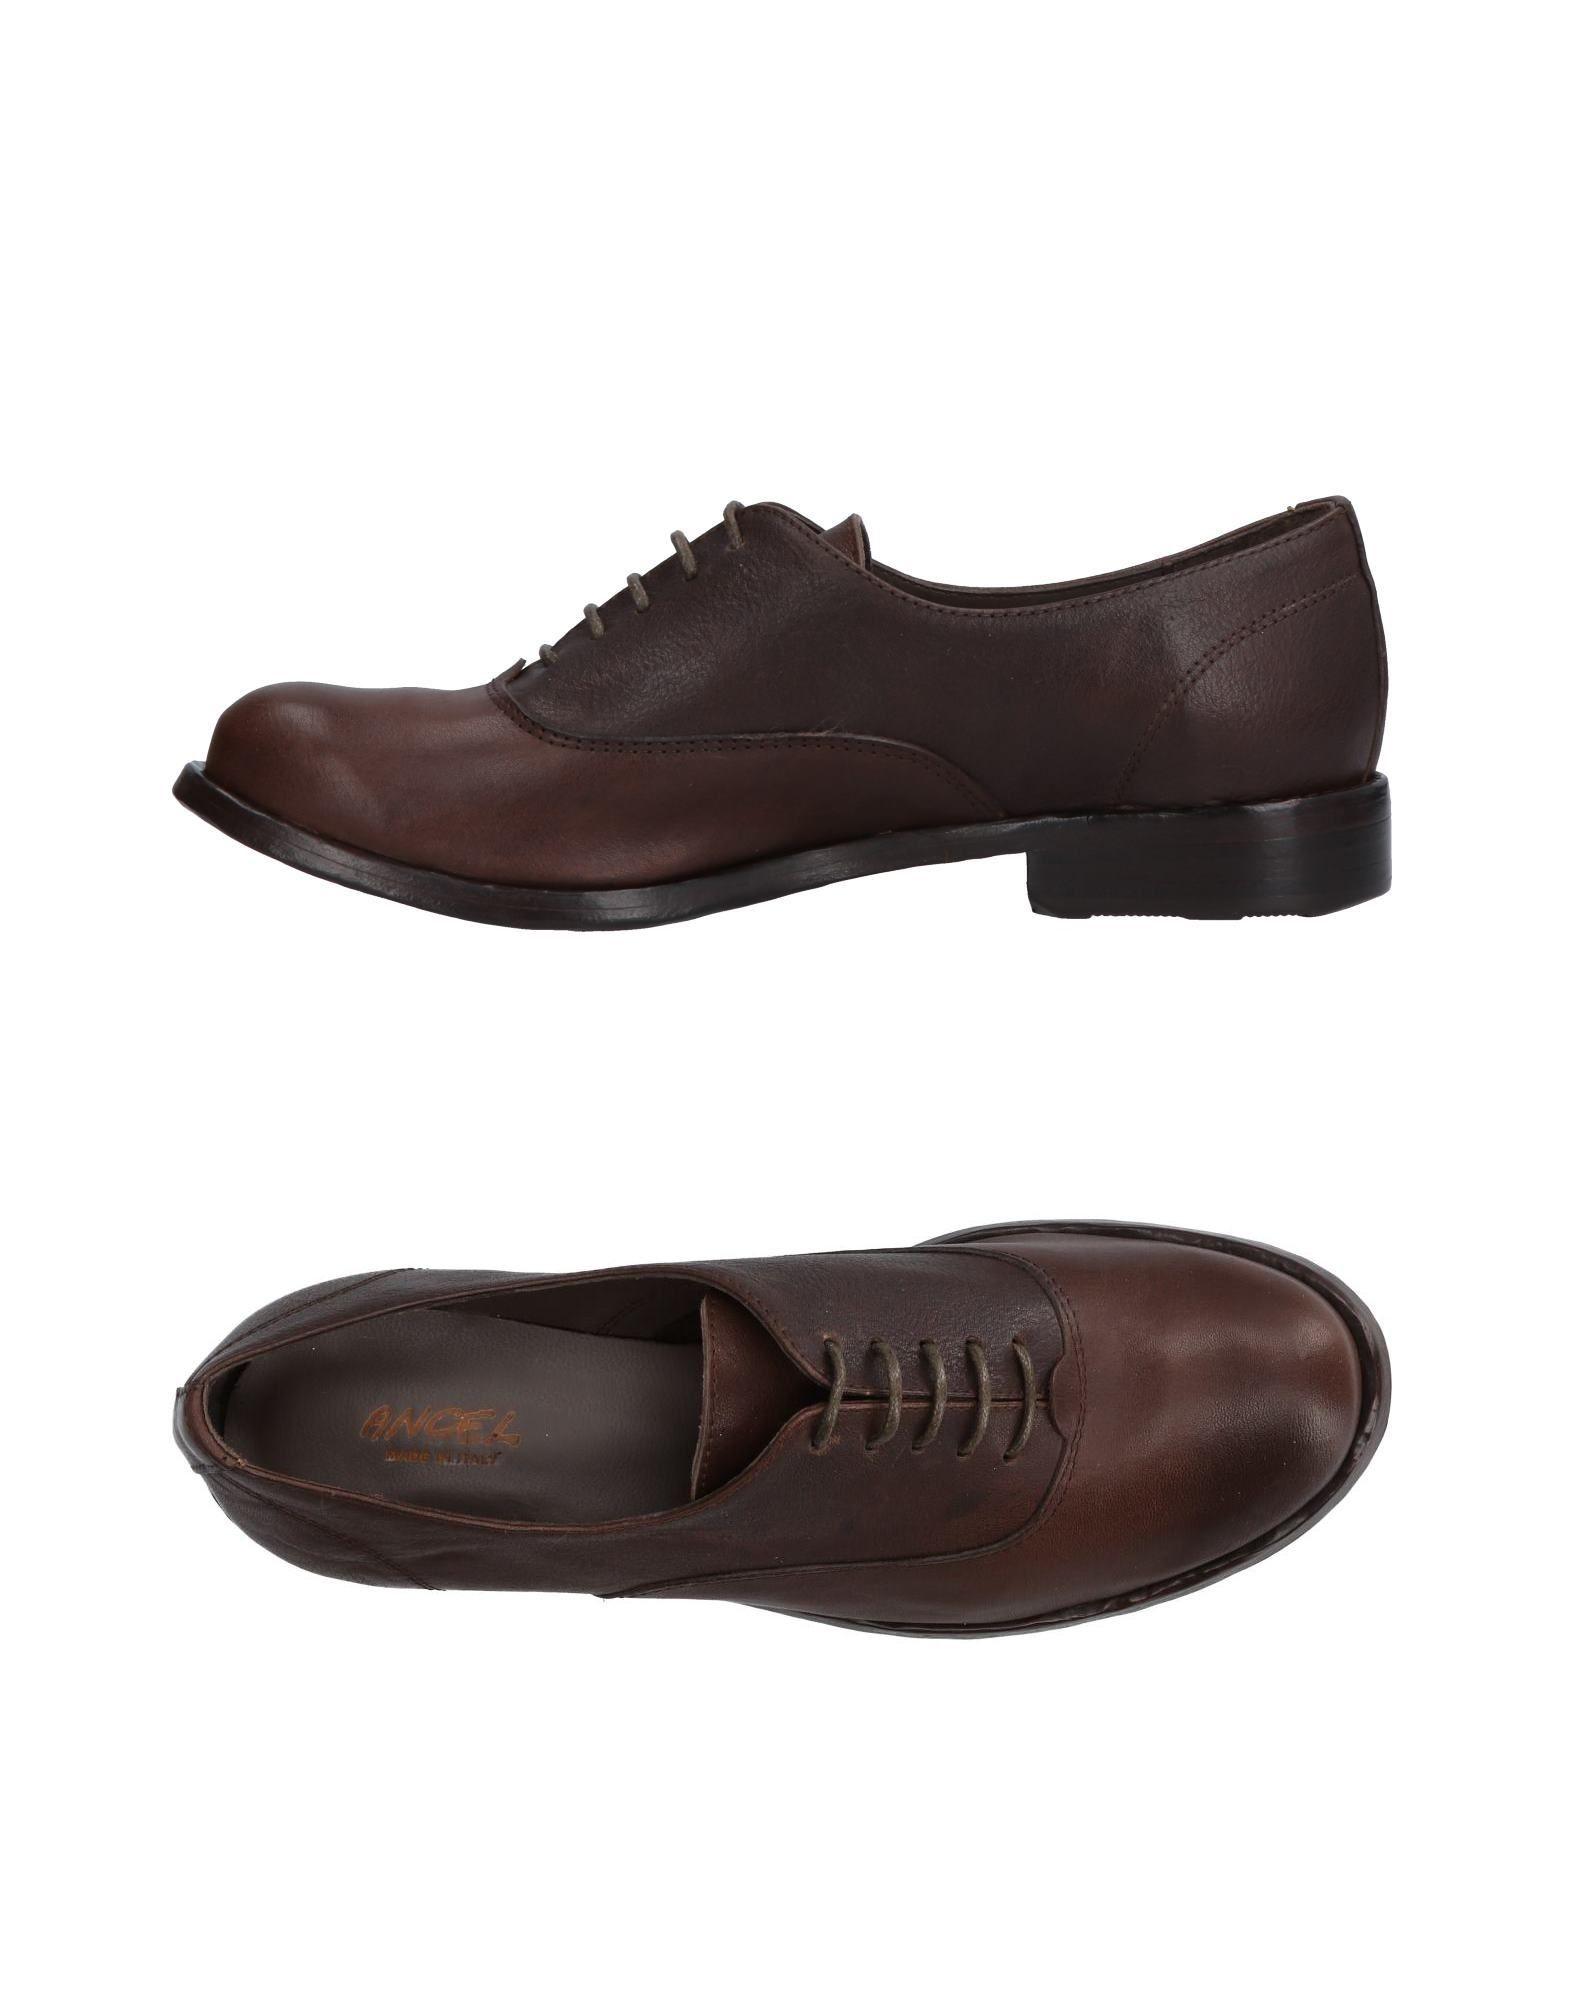 Angel Schnürschuhe Damen  11448487JW Gute Qualität beliebte Schuhe